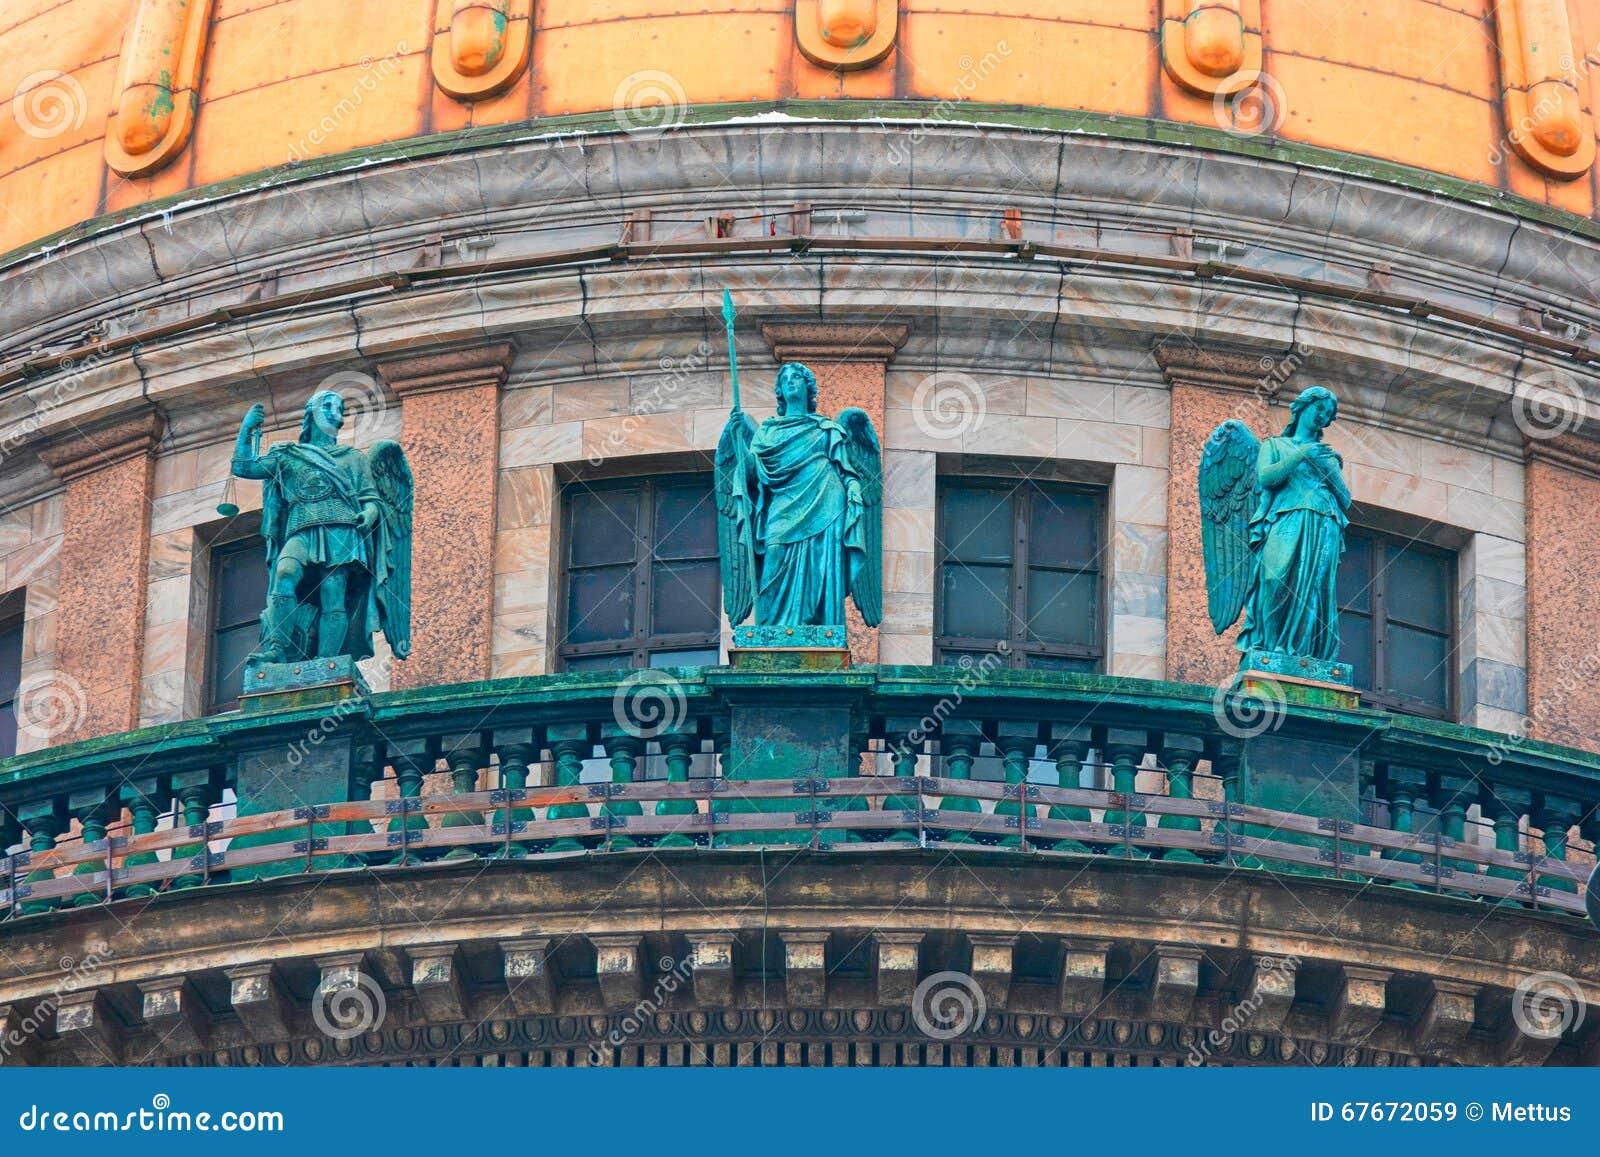 Angels originally from St. Petersburg 72